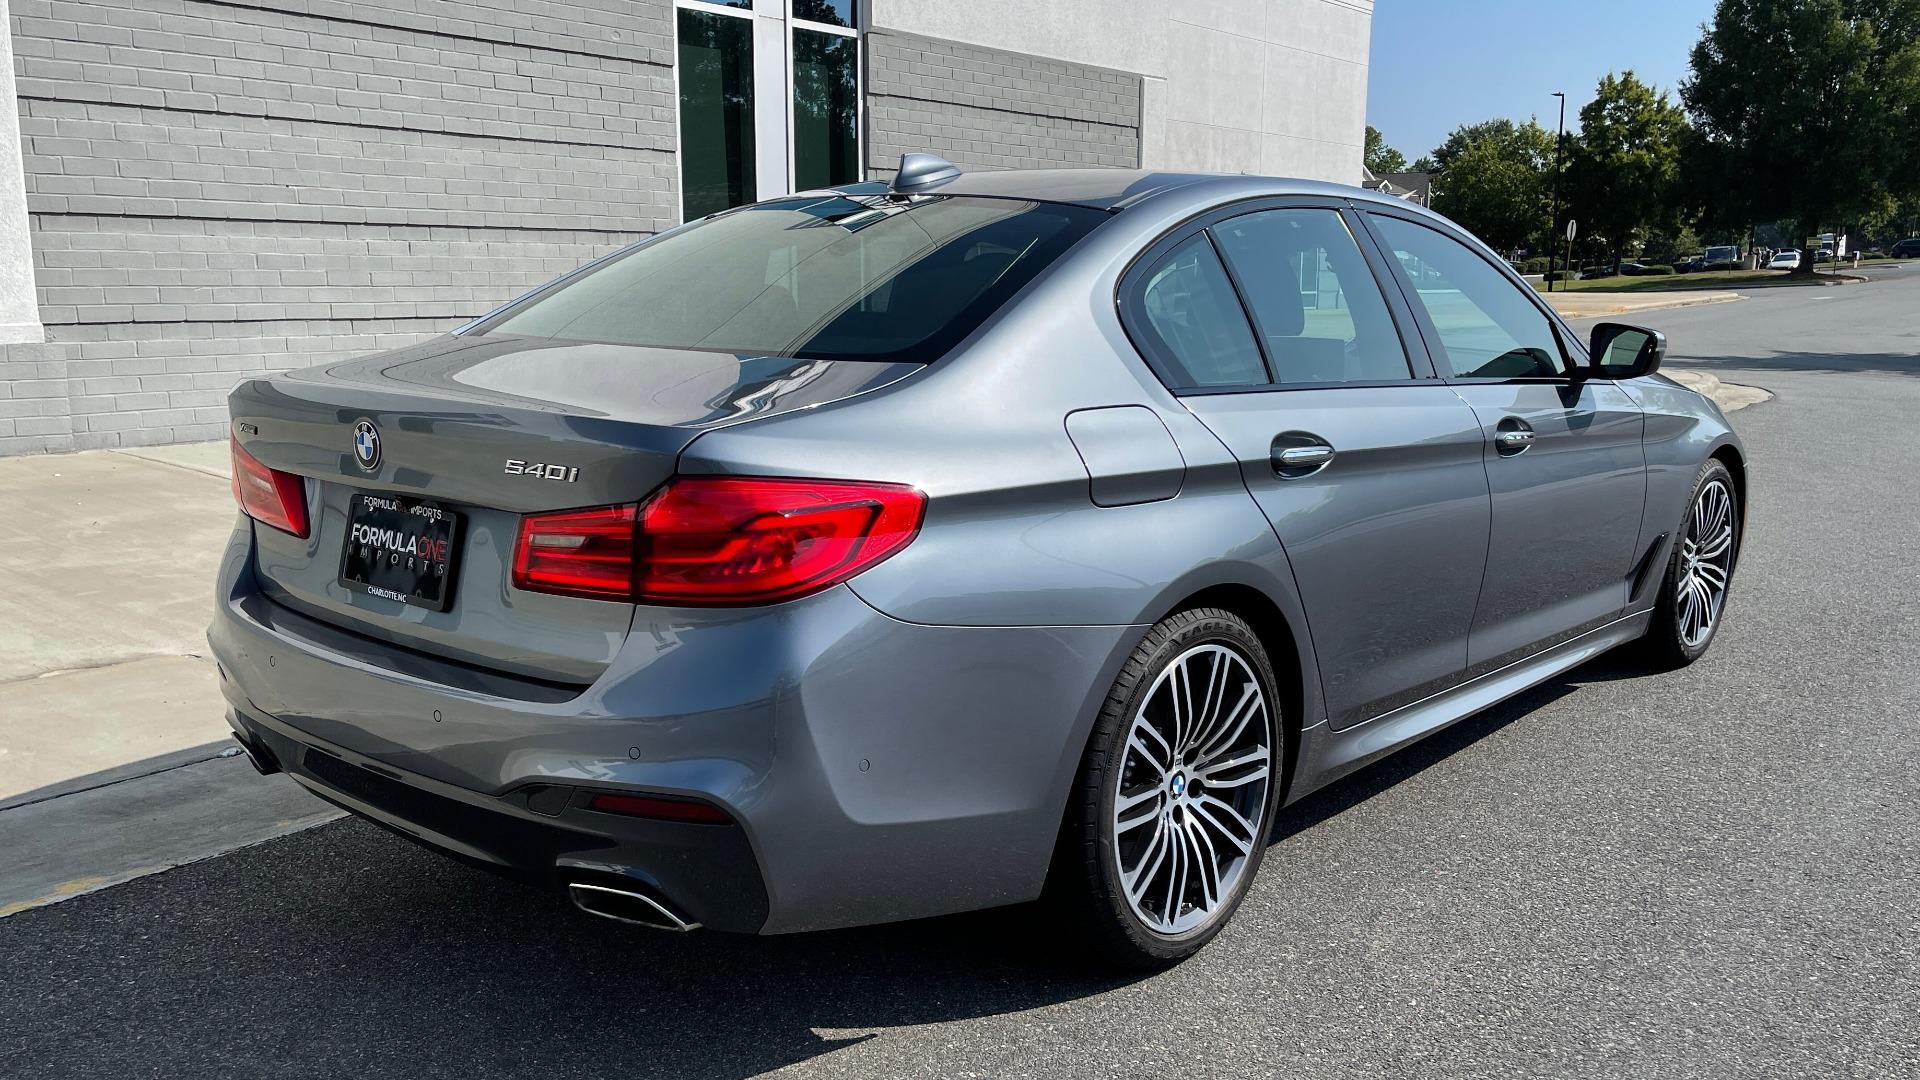 Used 2018 BMW 5 SERIES 540I XDRIVE M-SPORT / DRVR ASST / PDC / APPLE / HUD / H/K SND for sale $42,795 at Formula Imports in Charlotte NC 28227 2